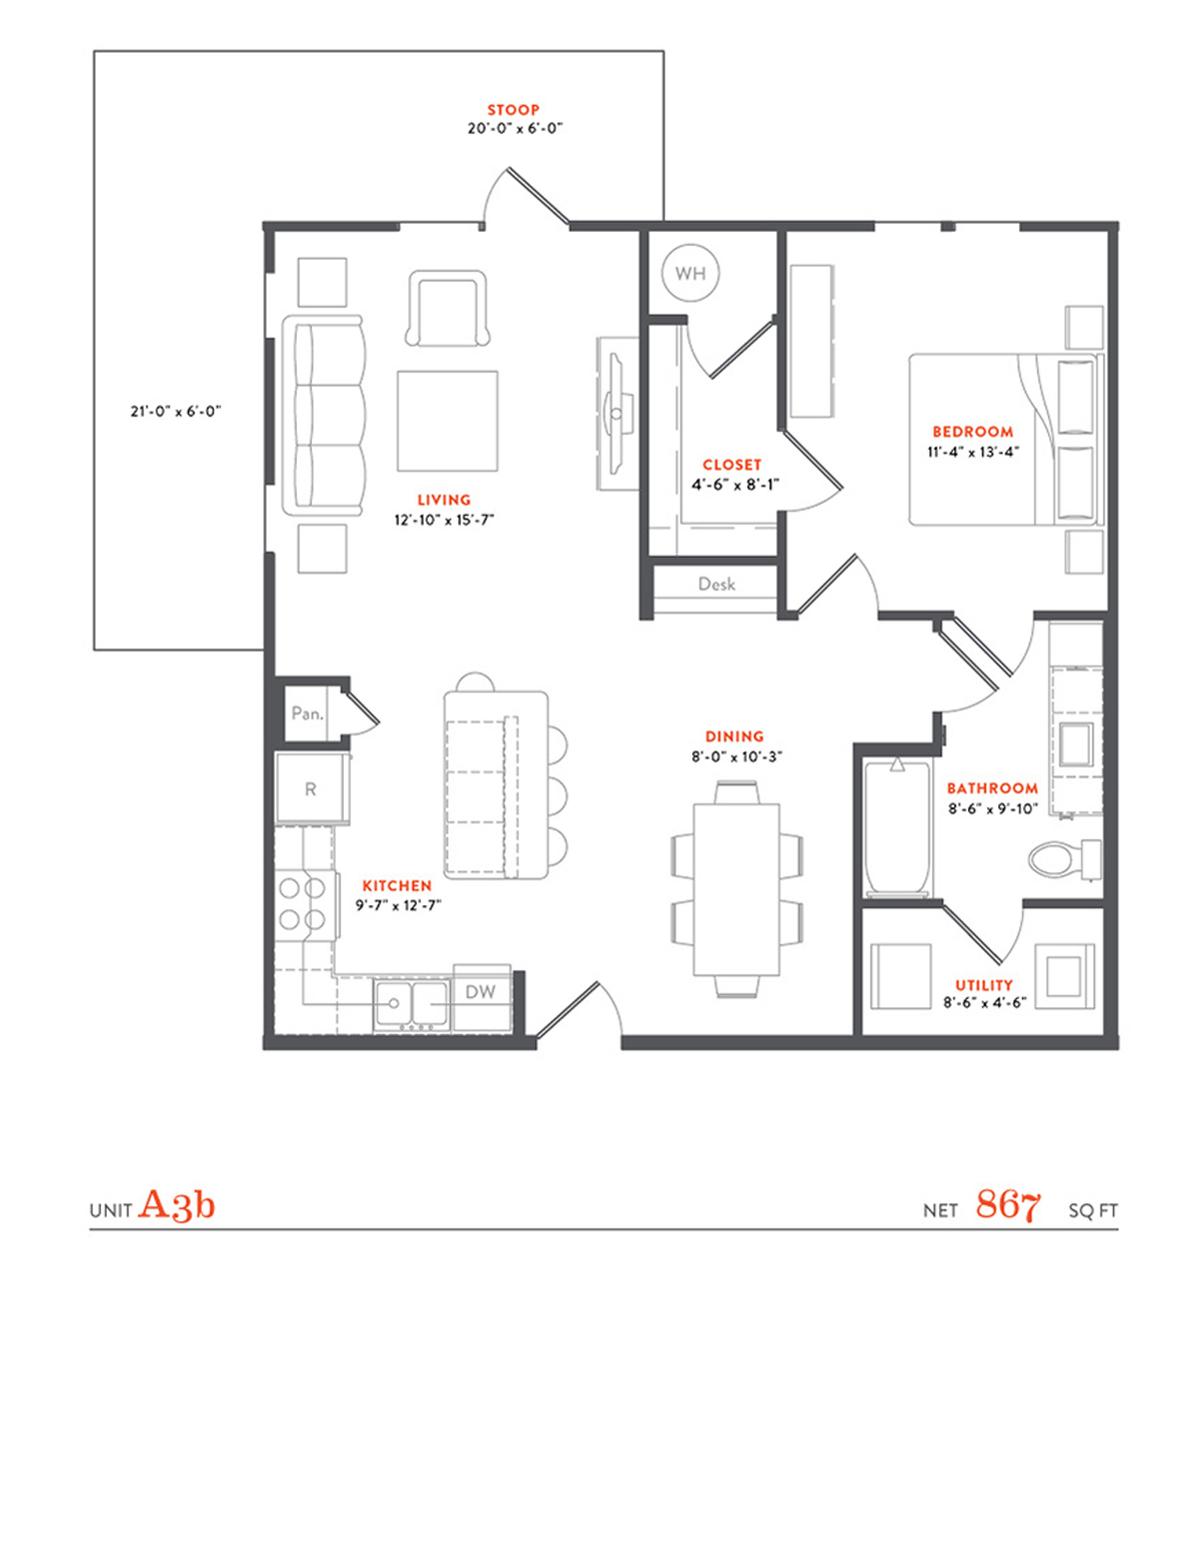 A3b_Stylized_Floor_Plan-01.jpg